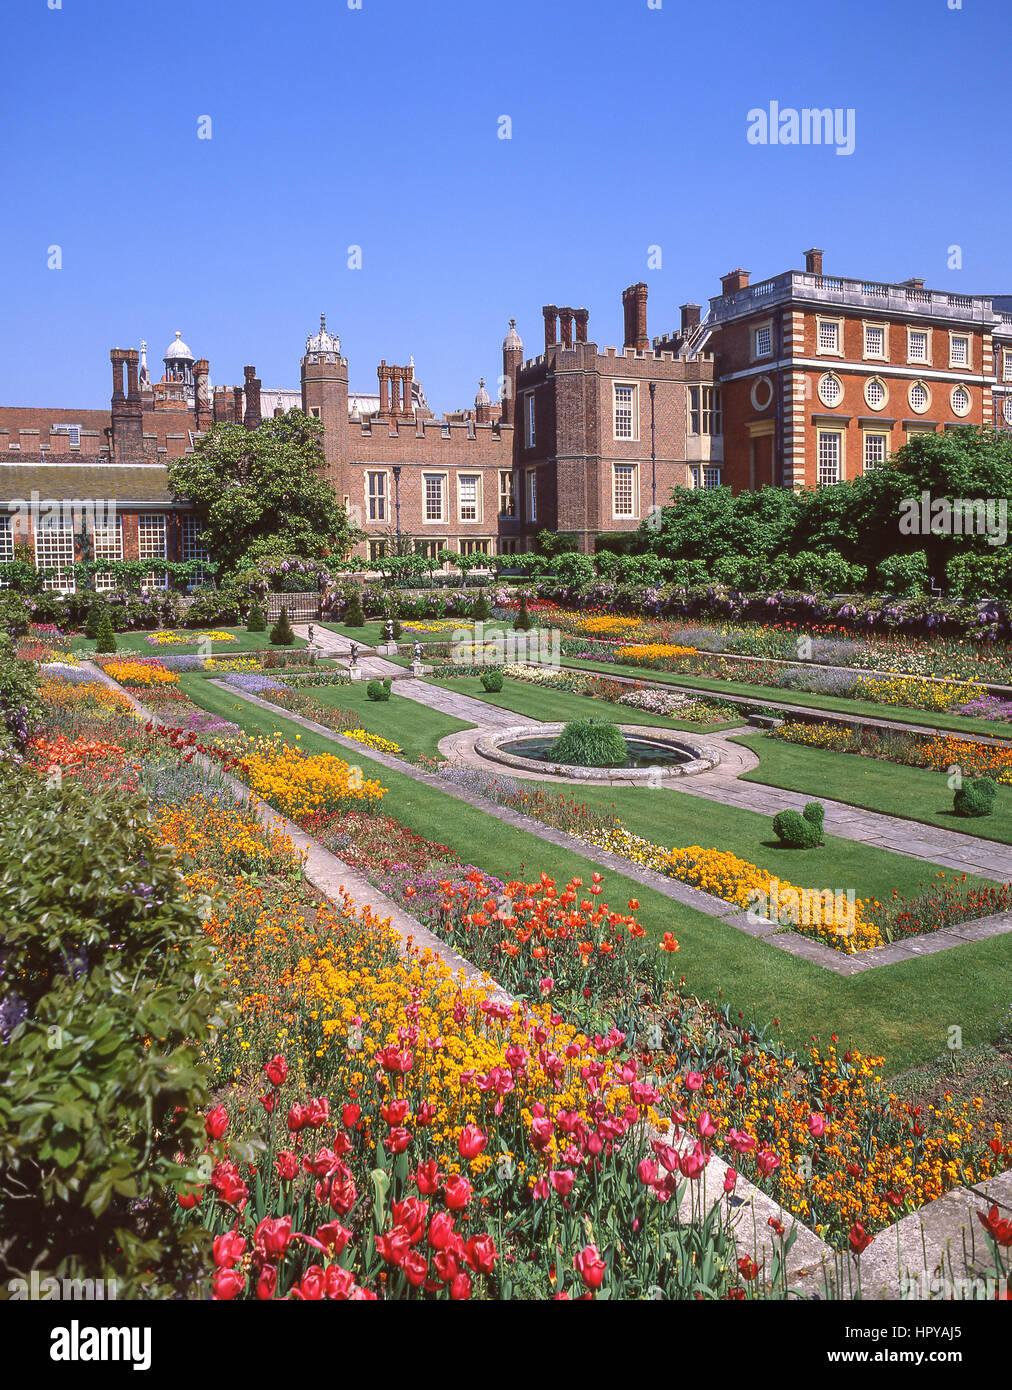 Palace gardens in spring, Hampton Court Palace, Hampton, Borough of Richmond upon Thames, Greater London, England, - Stock Image